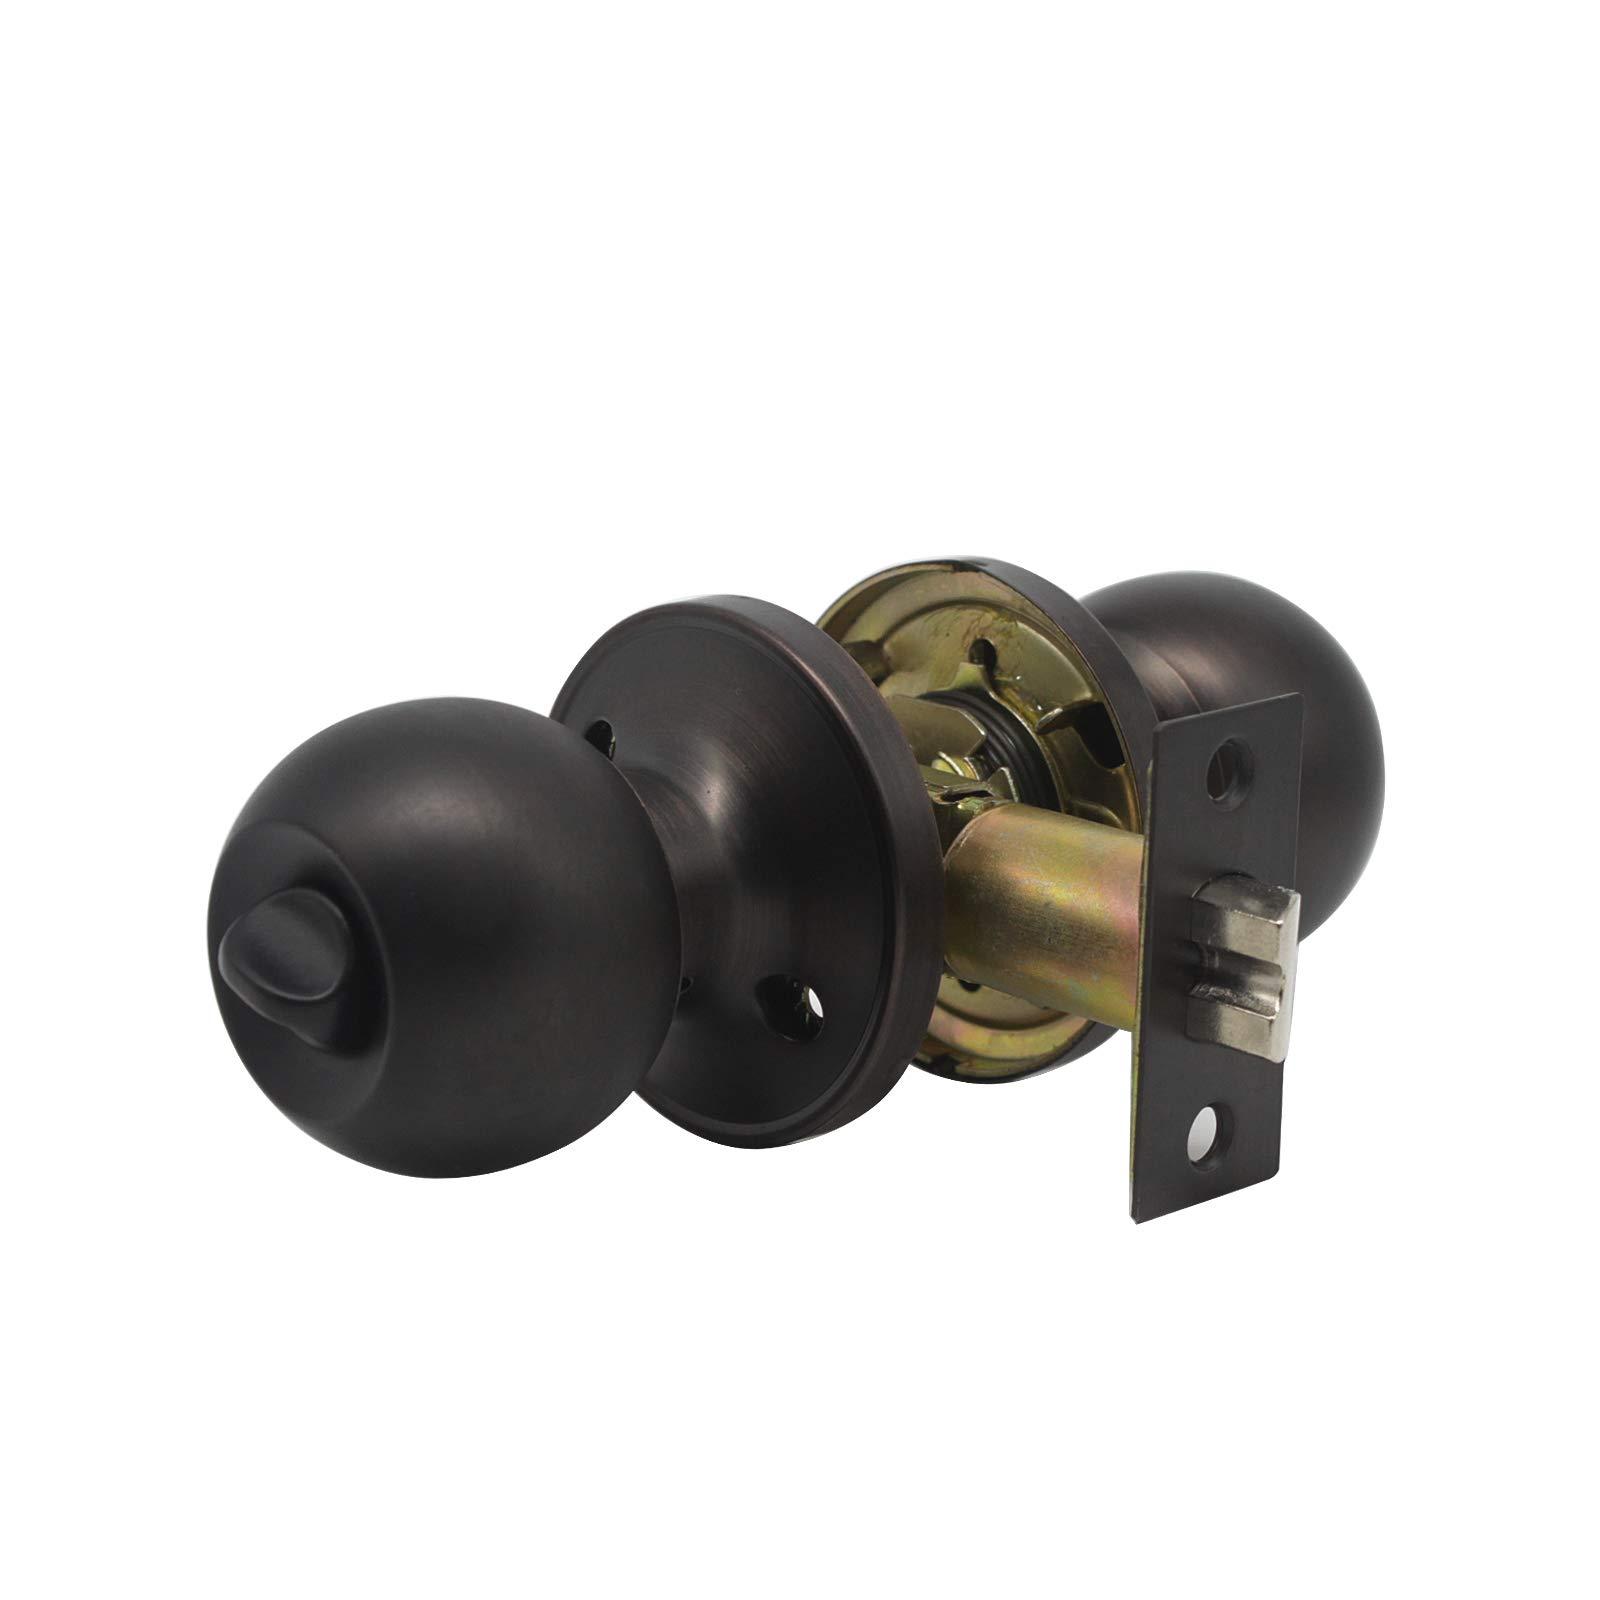 8 Pack Probrico Interior Round Privacy Keyless Door Knobs Door Lock Lockset Without Key Doorknobs Oil Rubbed Bronze for Bedroom and Bathroom-Door Knob 607 by Probrico (Image #4)